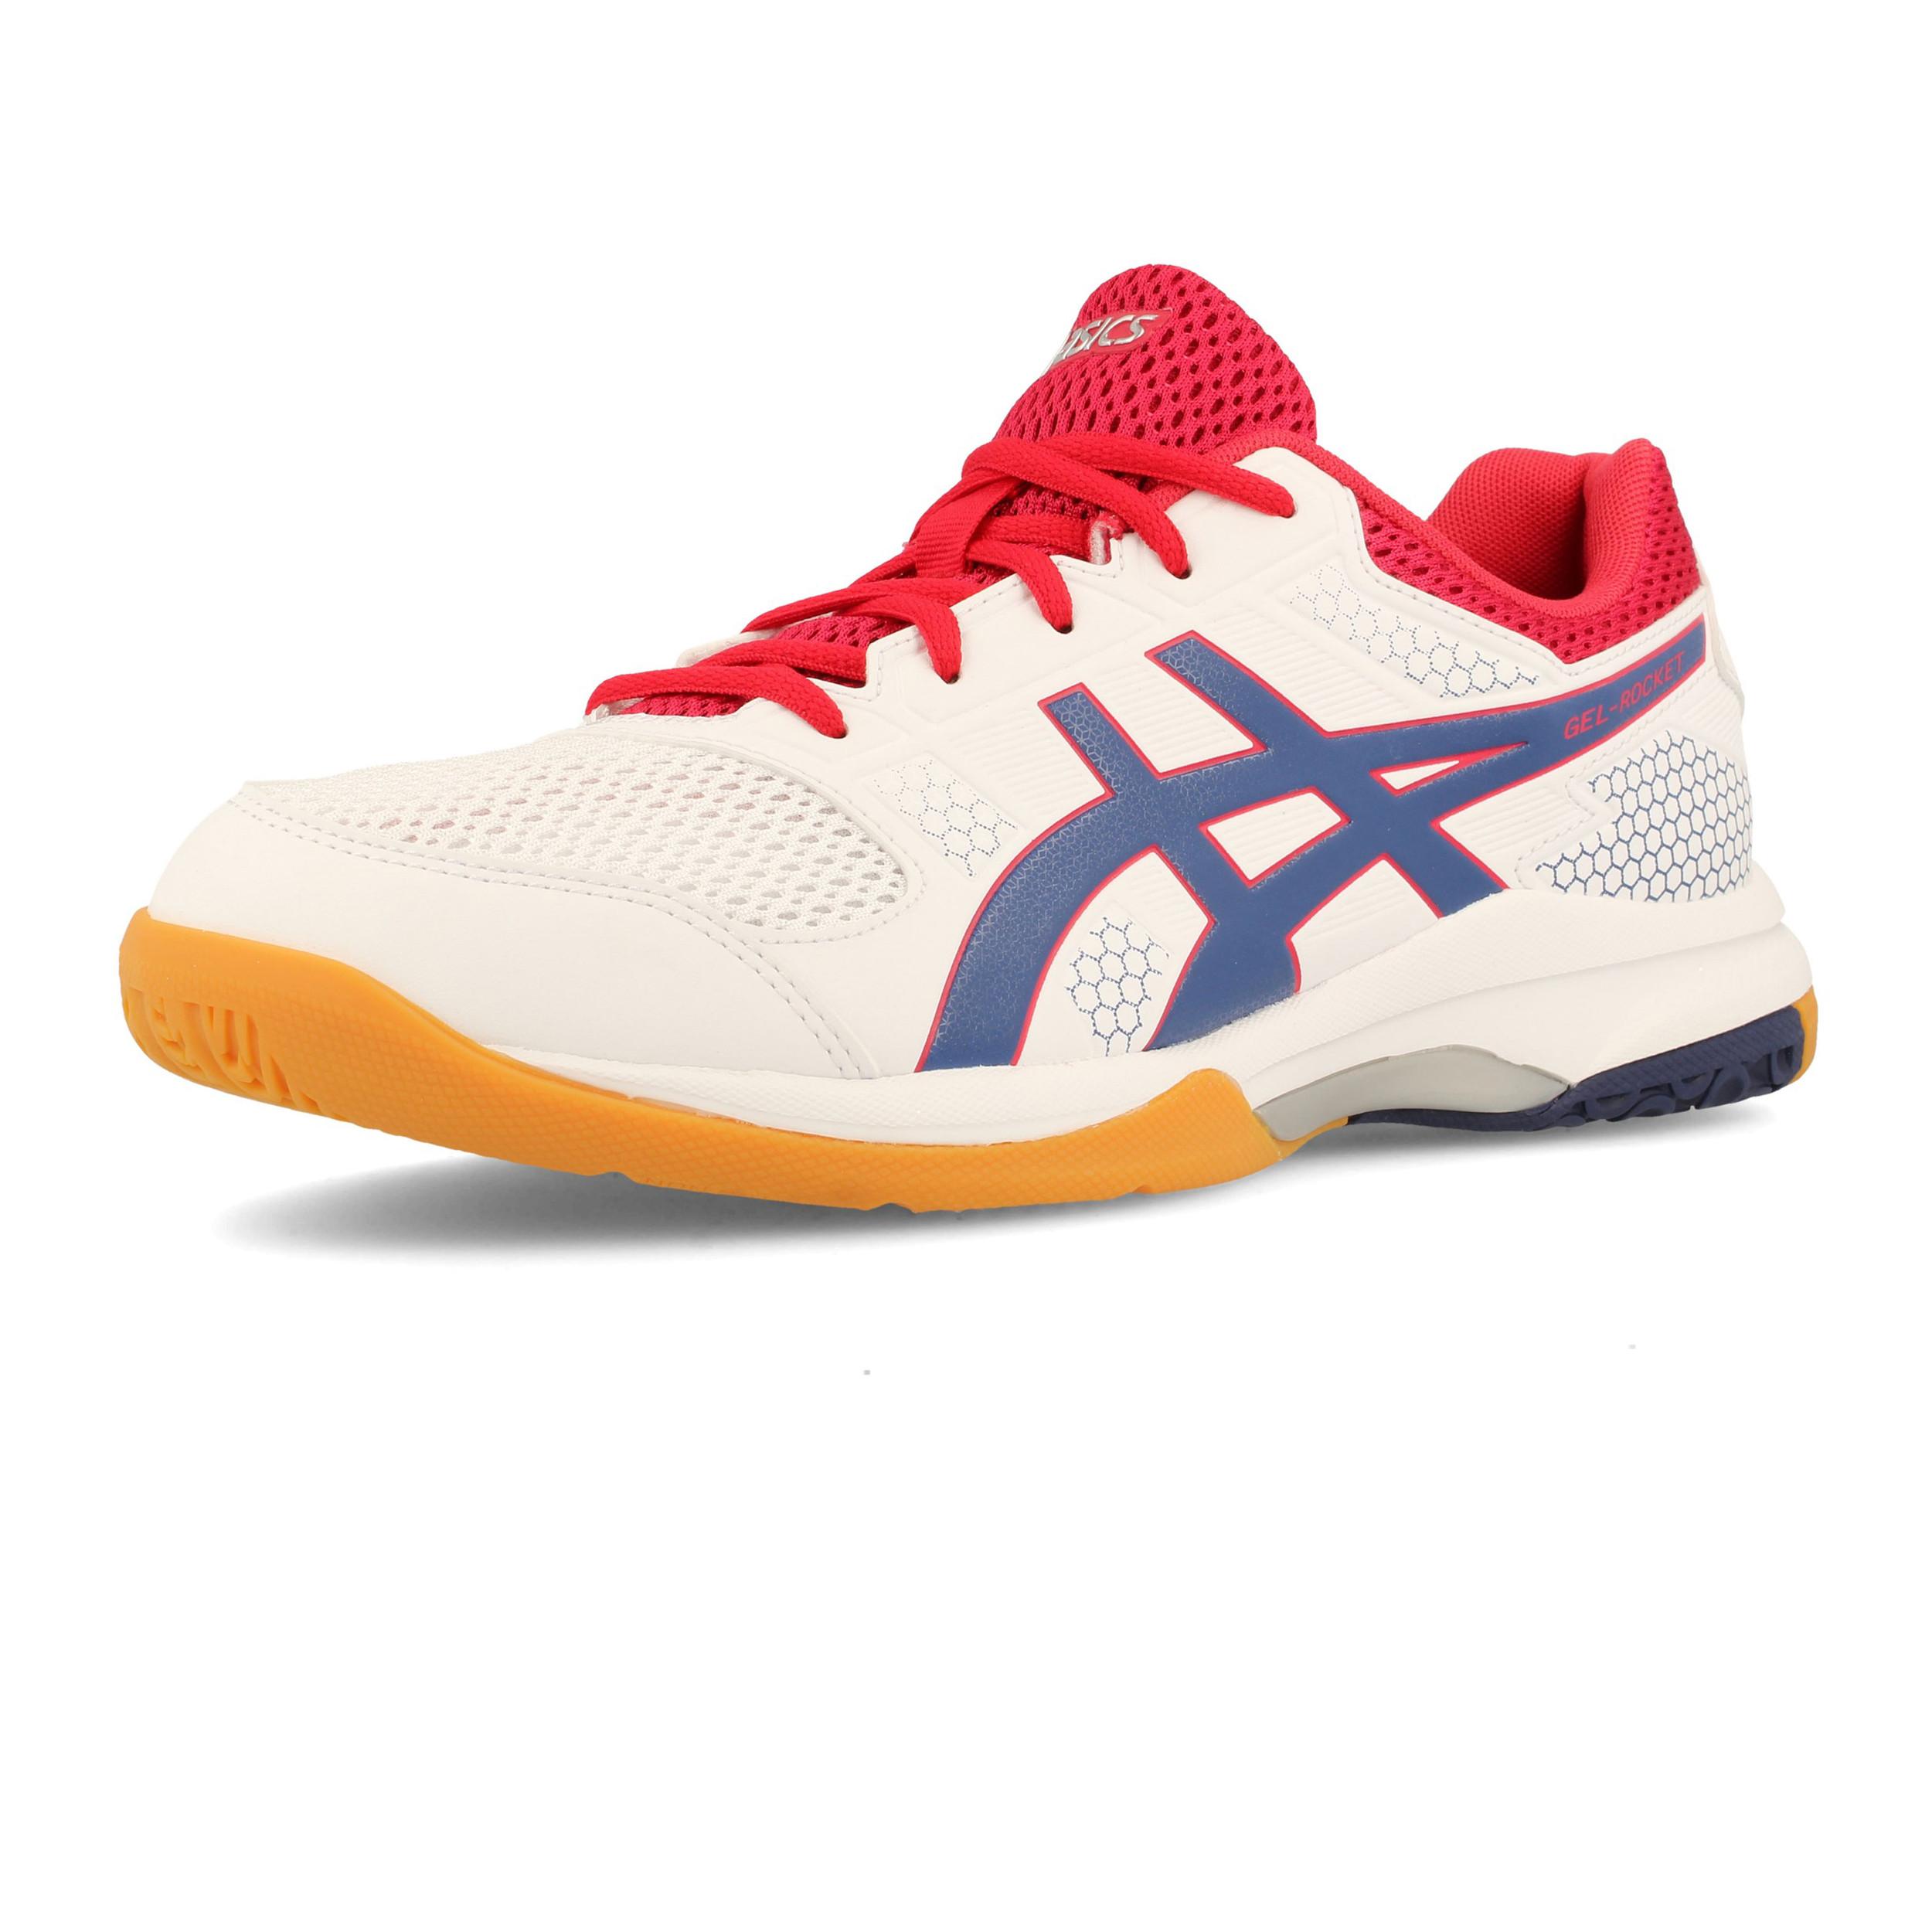 ASICS Uomo Gel Rocket 8 Scarpe Da Ginnastica Interne Sala Sport Sneakers  Bianco 75813613102